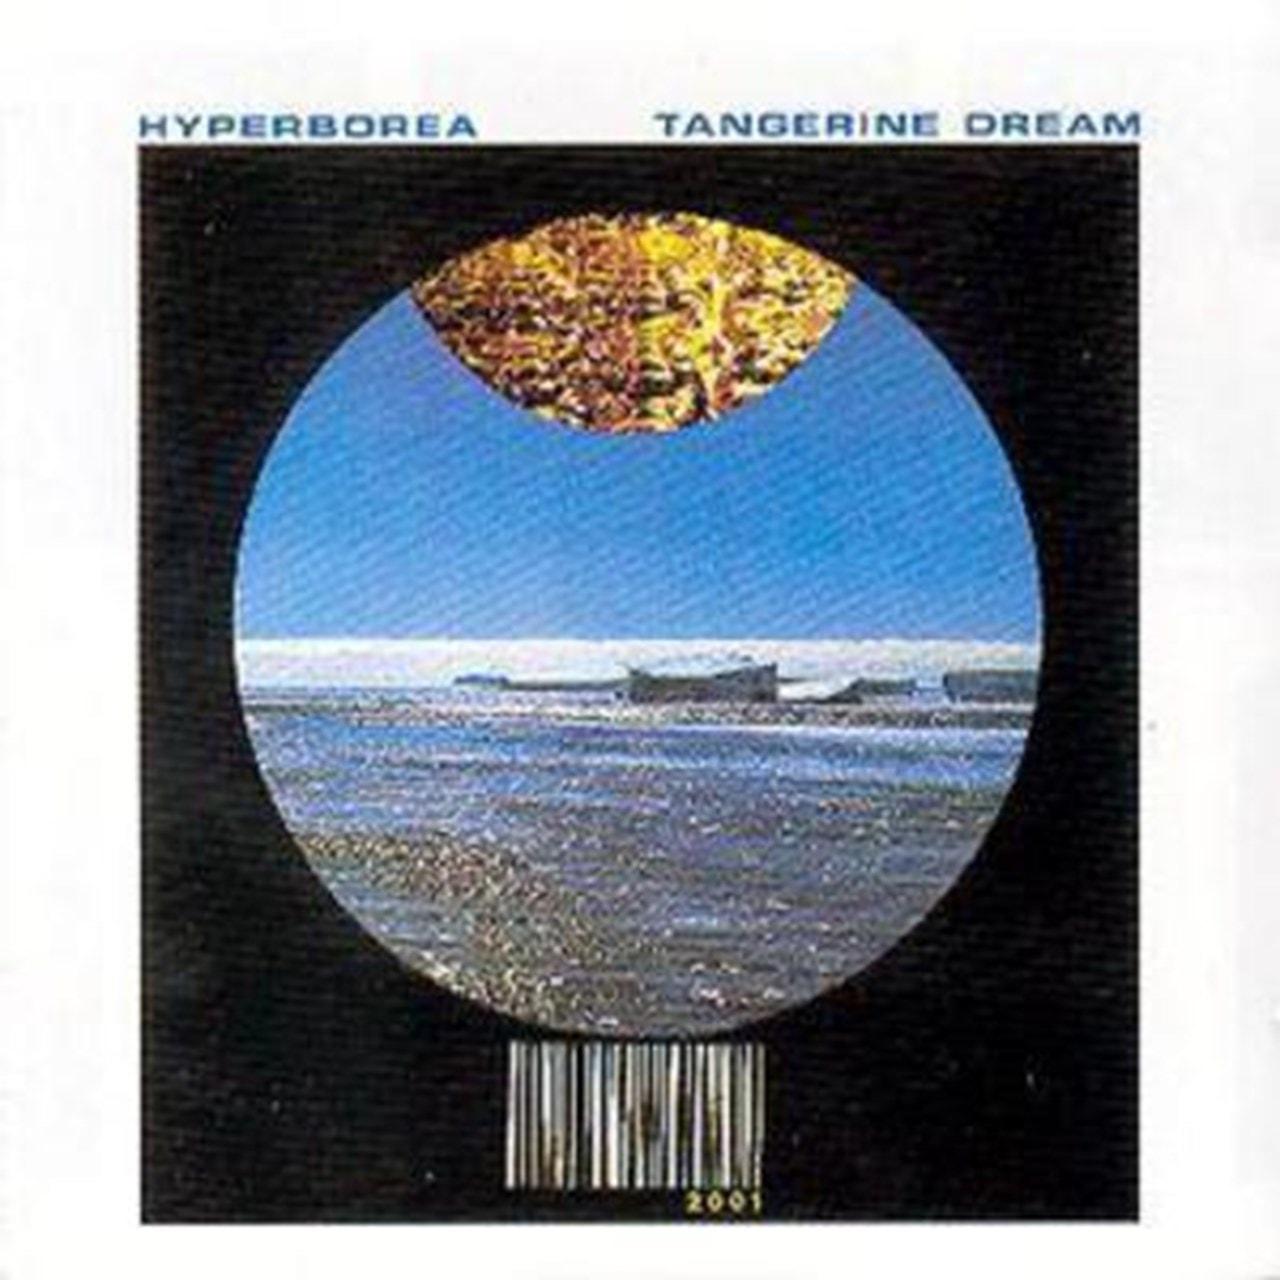 Hyperborea - 1